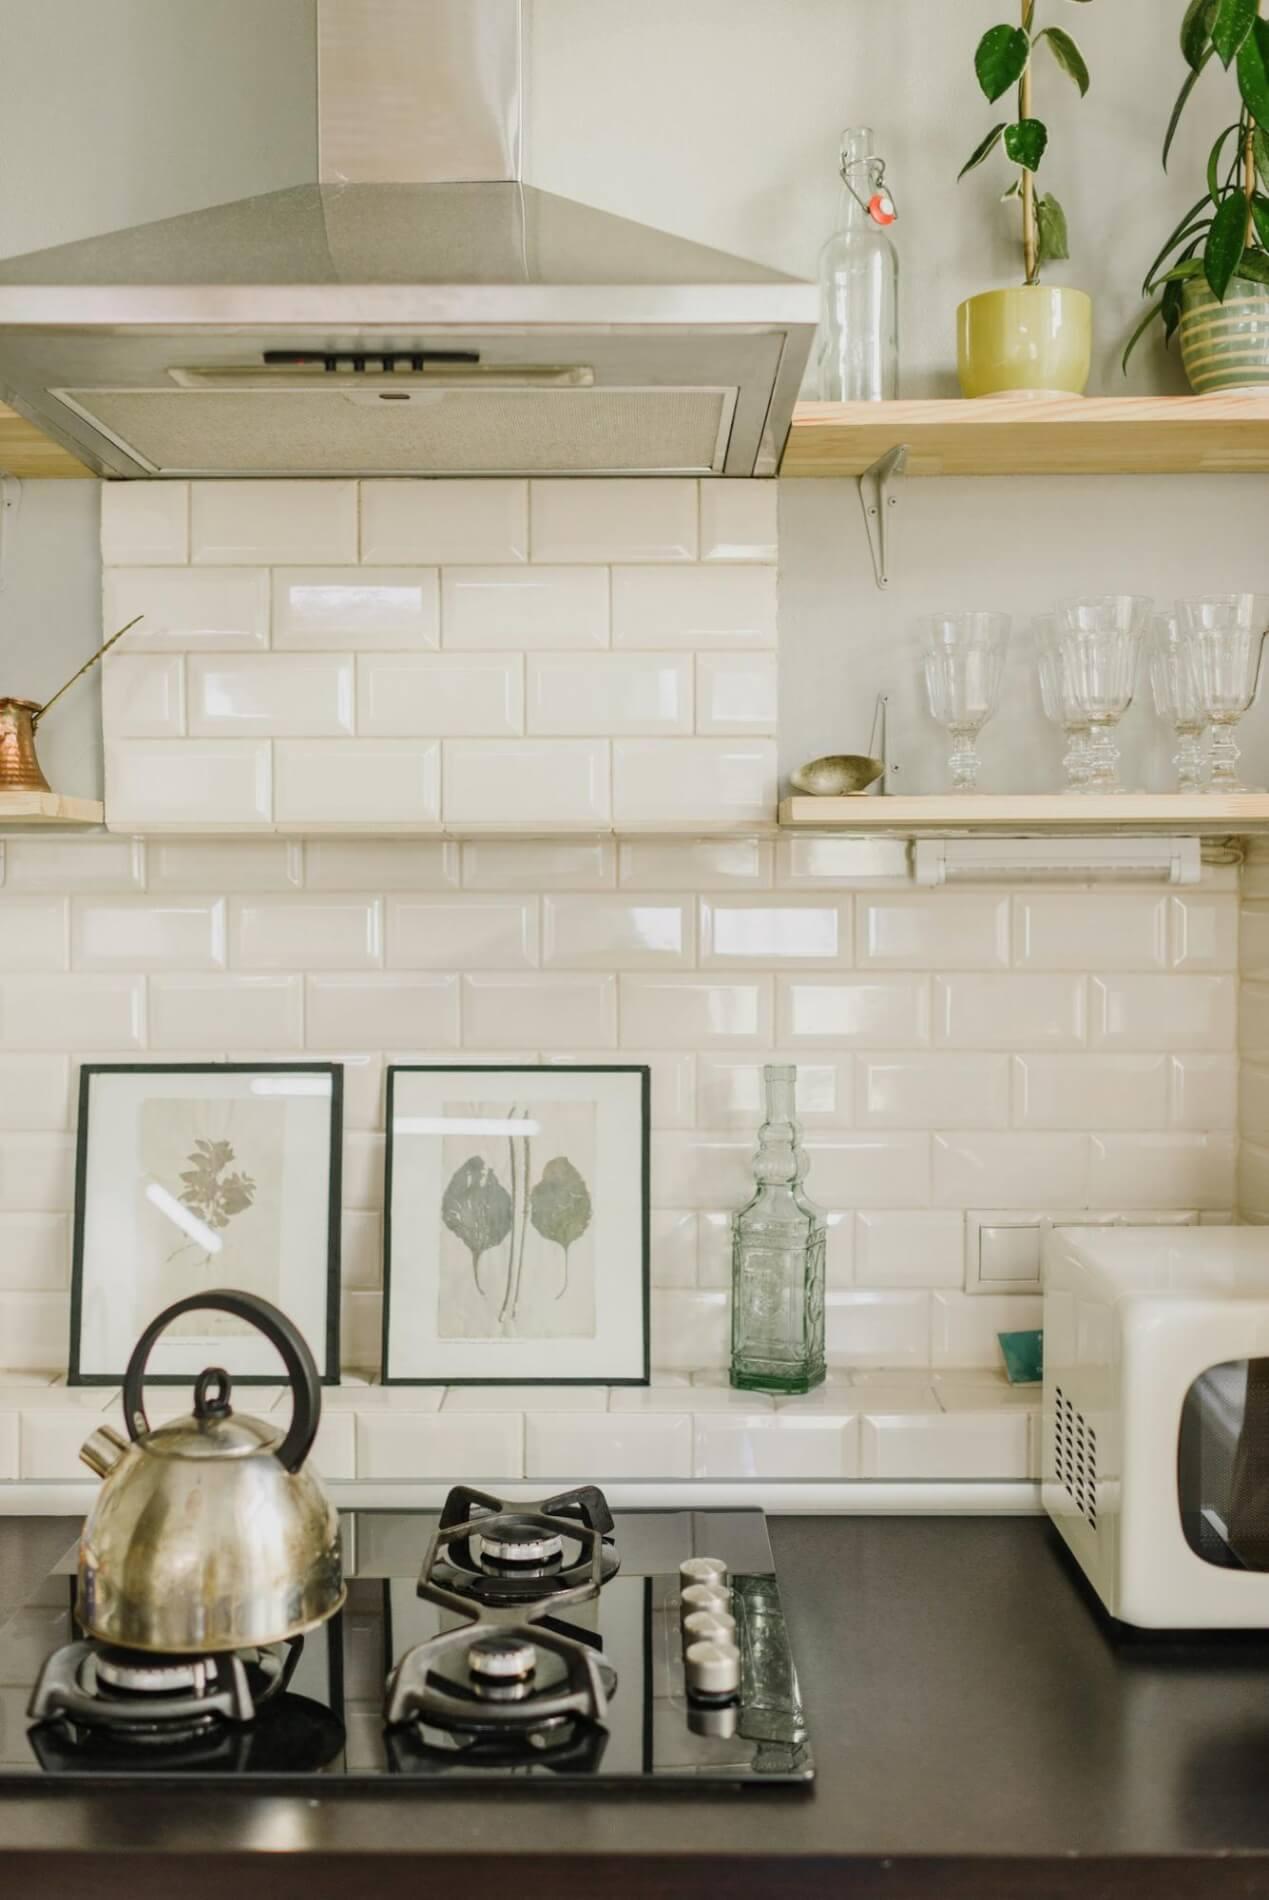 Solid countertop with tile backsplash